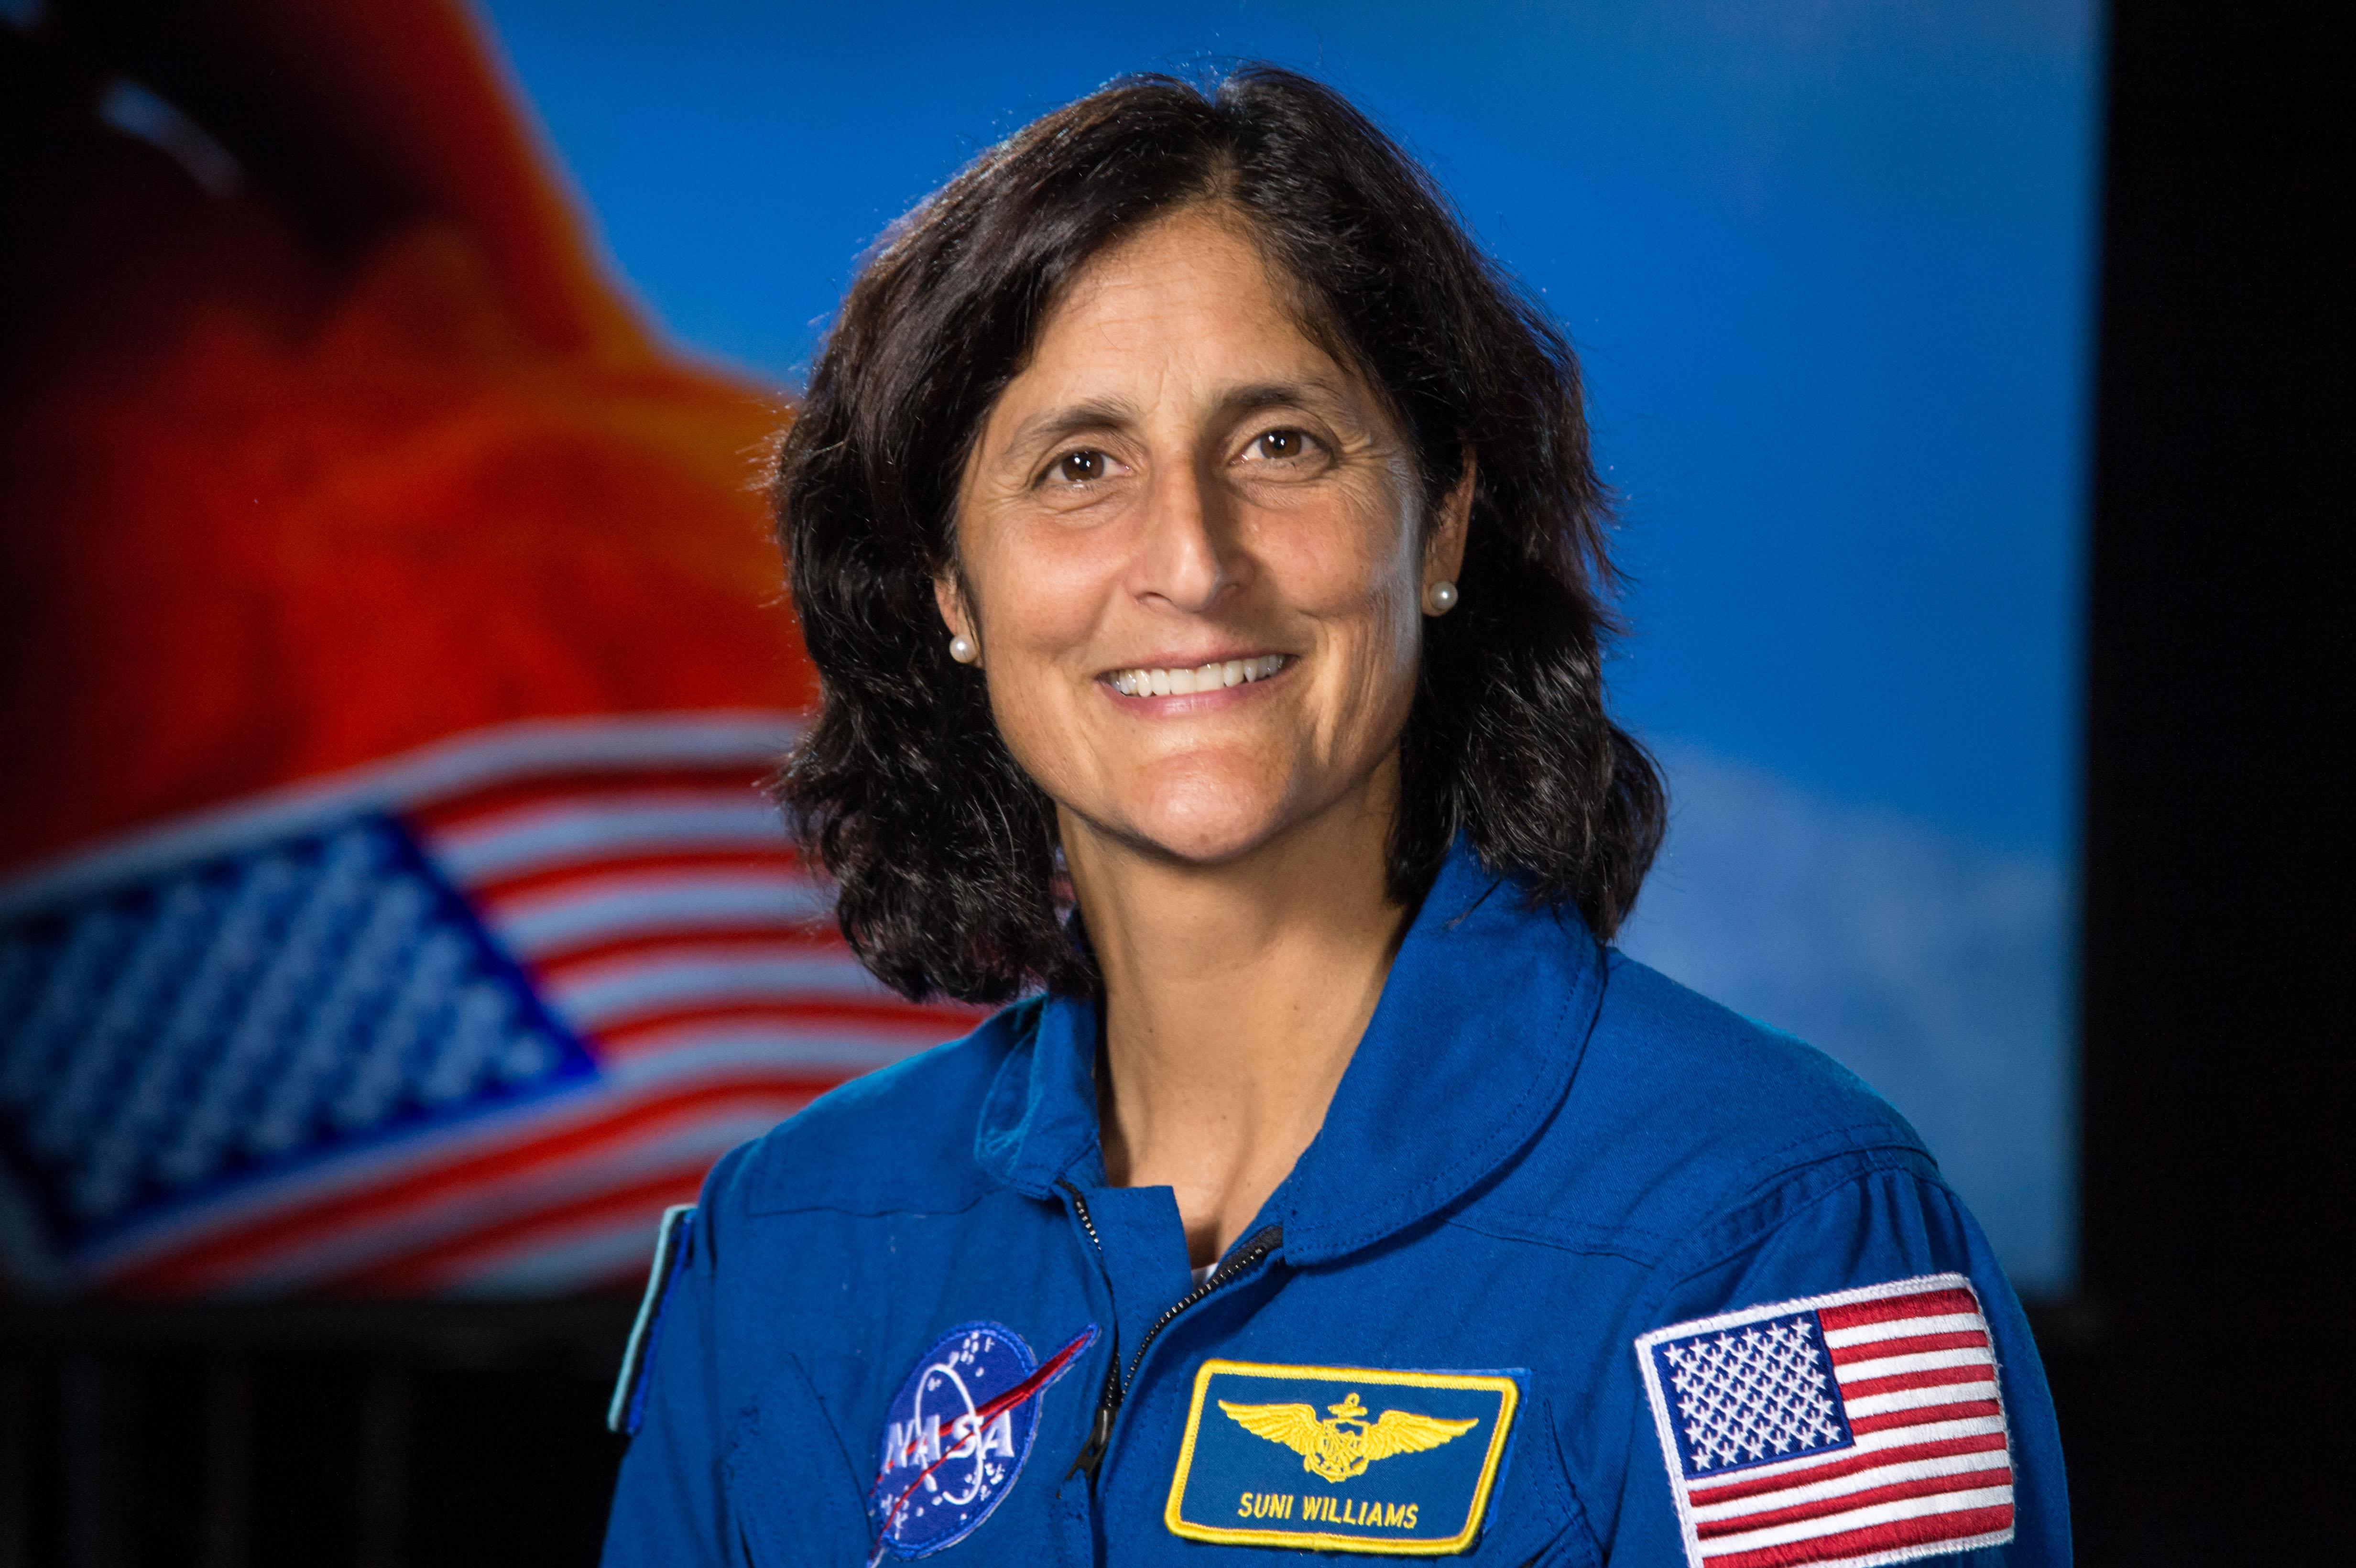 suni williams astronaut - photo #7